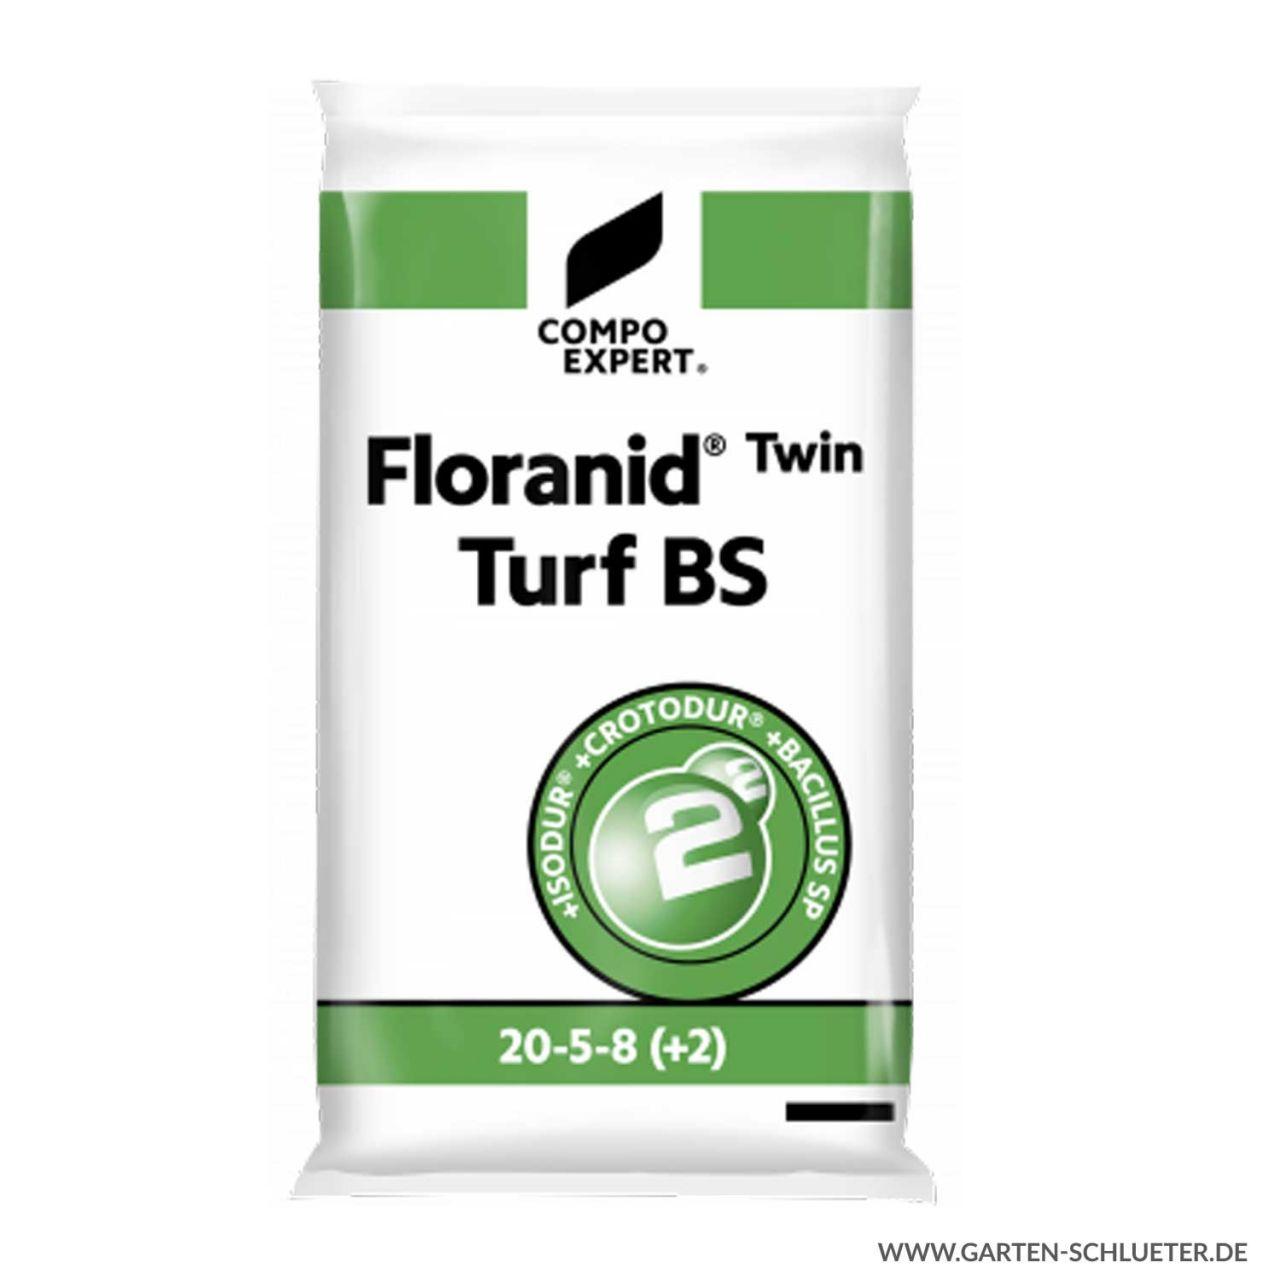 Langzeit Rasen-Volldünger - Compo Expert® Floranid® Twin Turf BS 20-5-8 (+2) ...